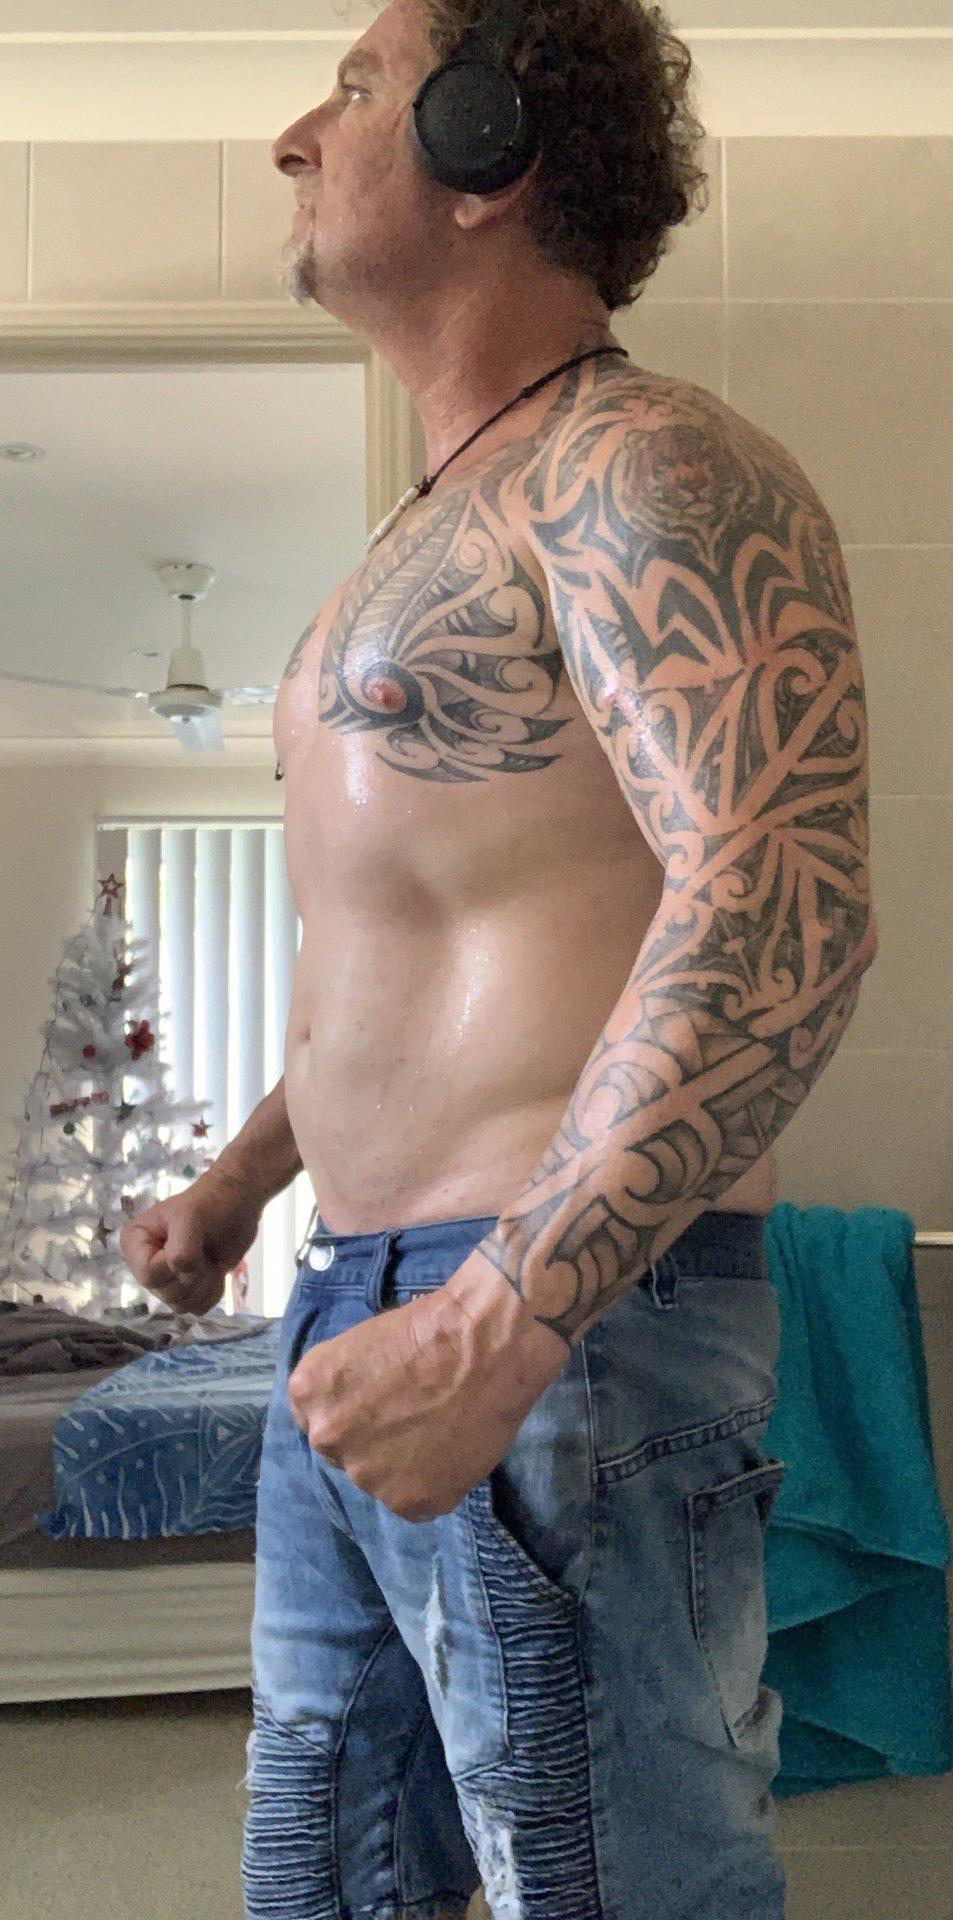 Kiwiboyfuck from Queensland,Australia